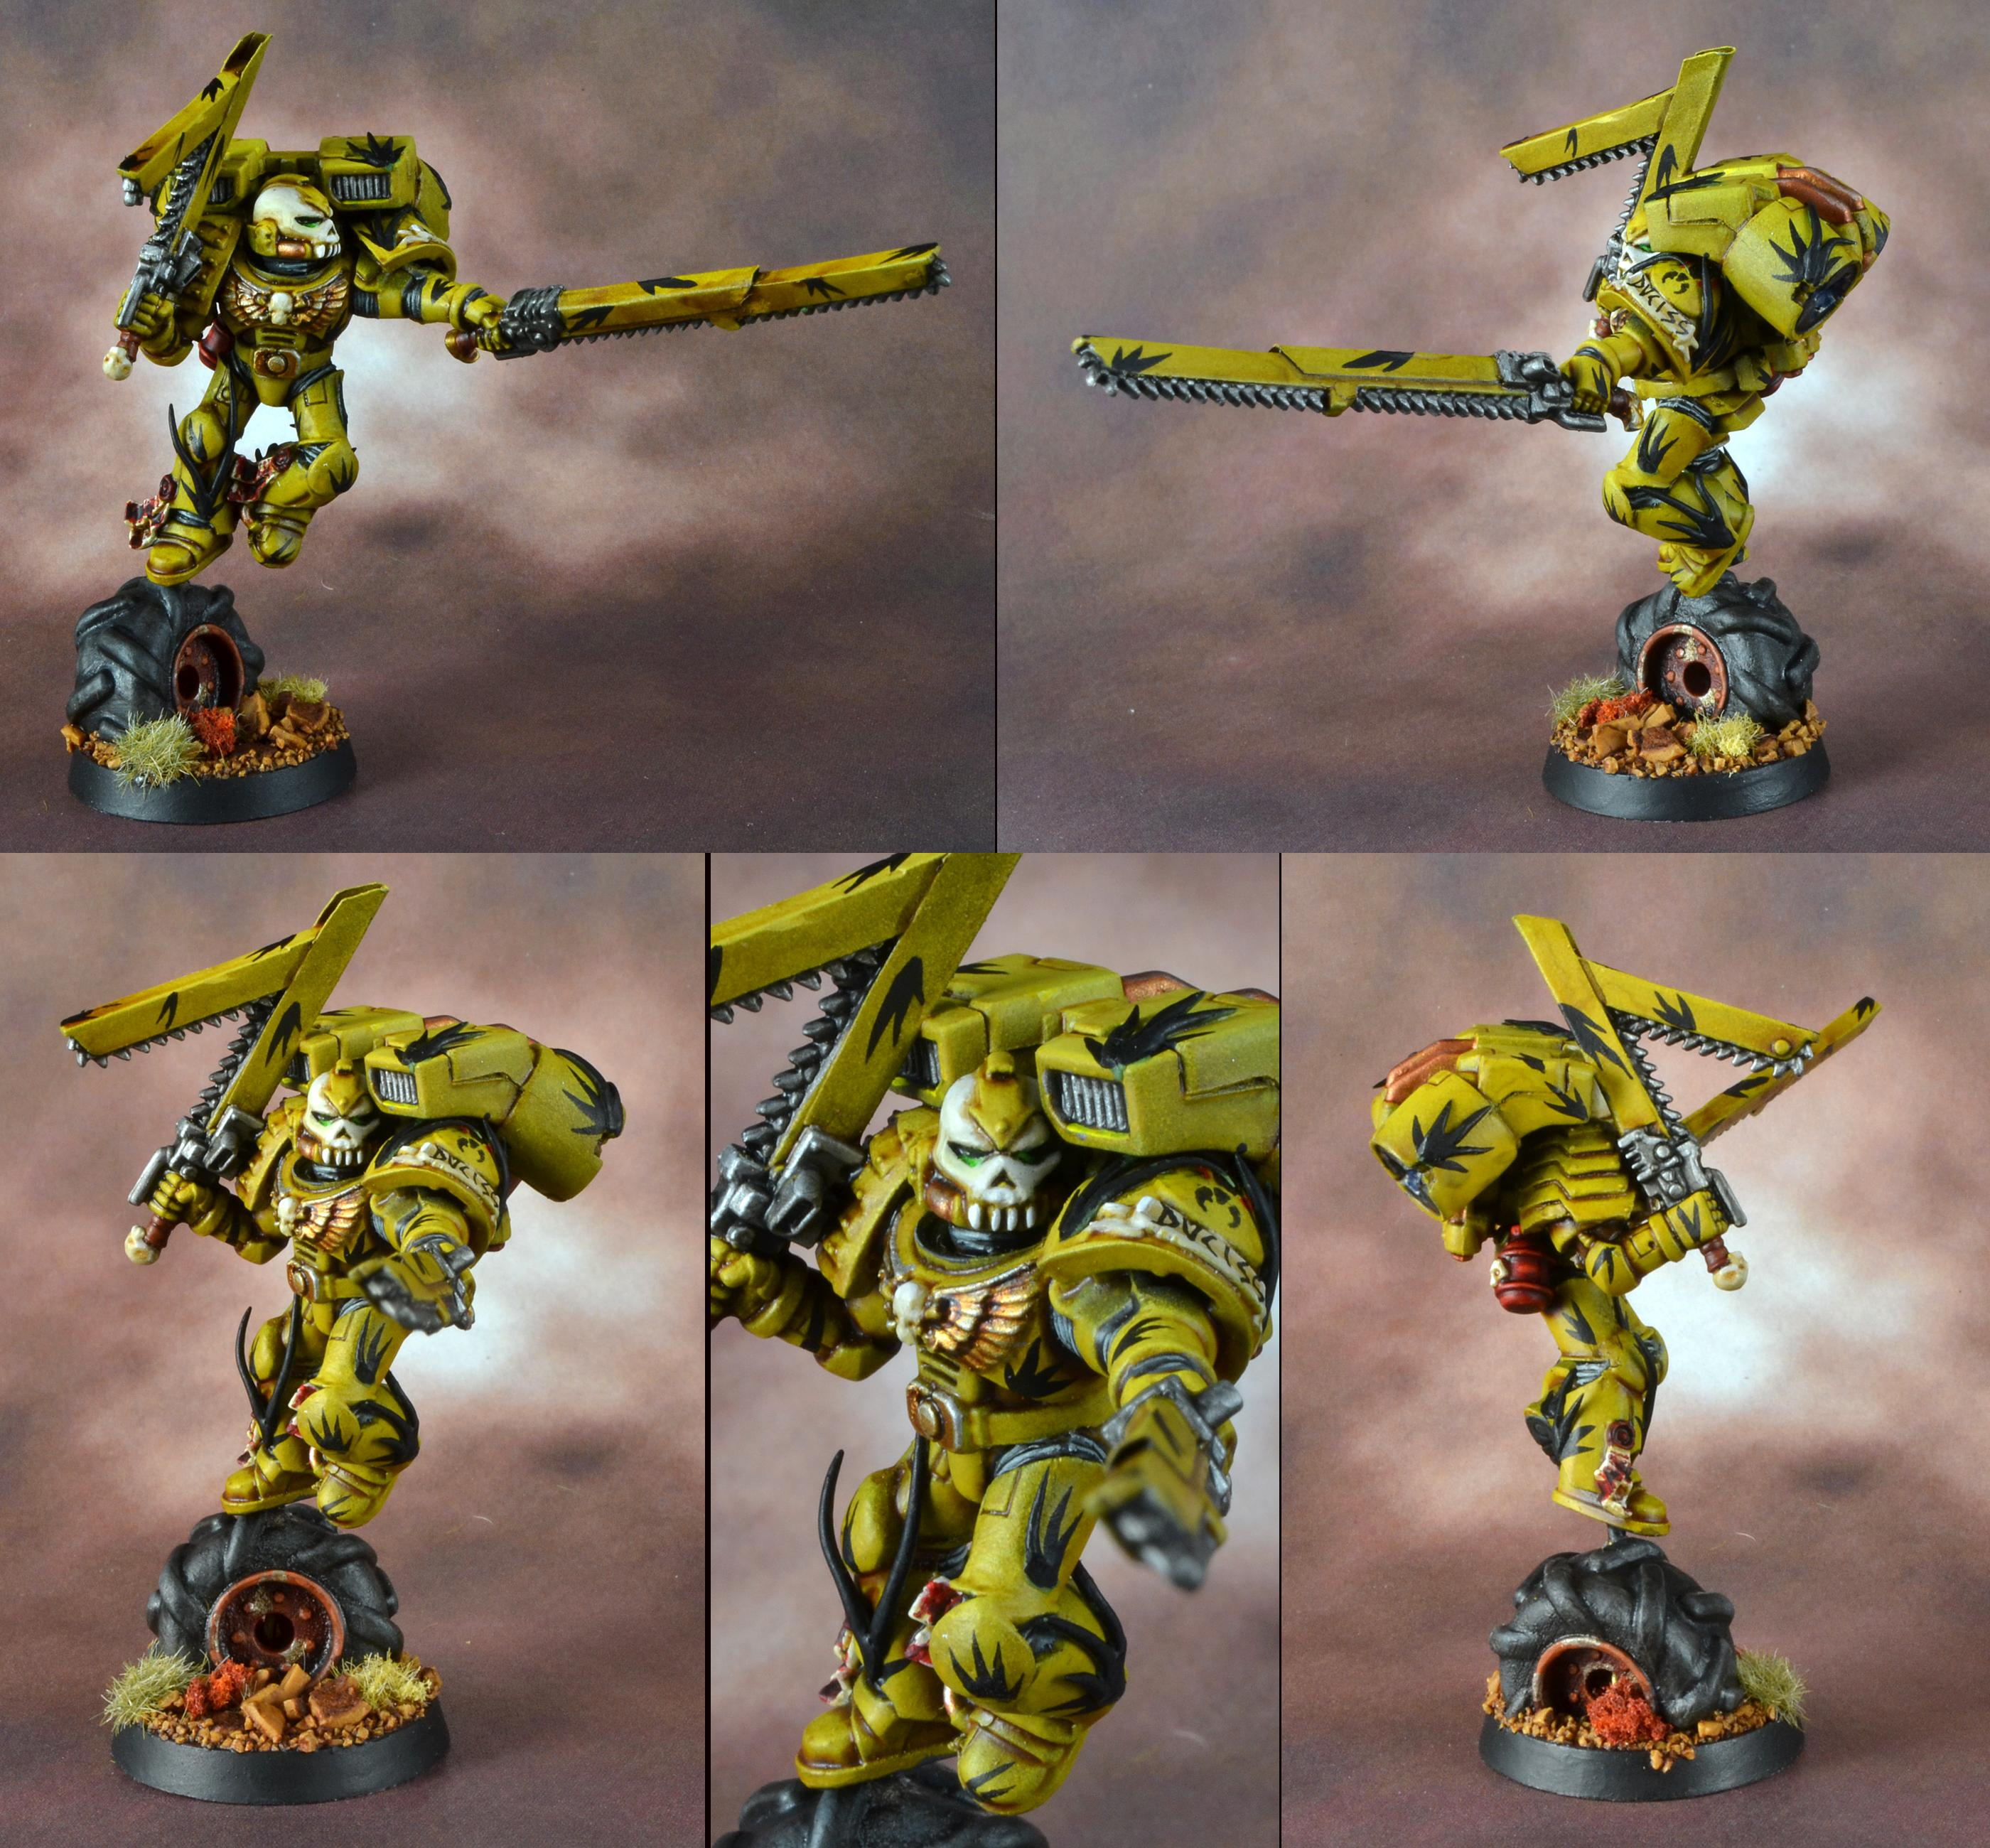 Gms, Mantis Warrior, Space Marines, Tranquility Camo, Vanguard, Warhammer 40,000